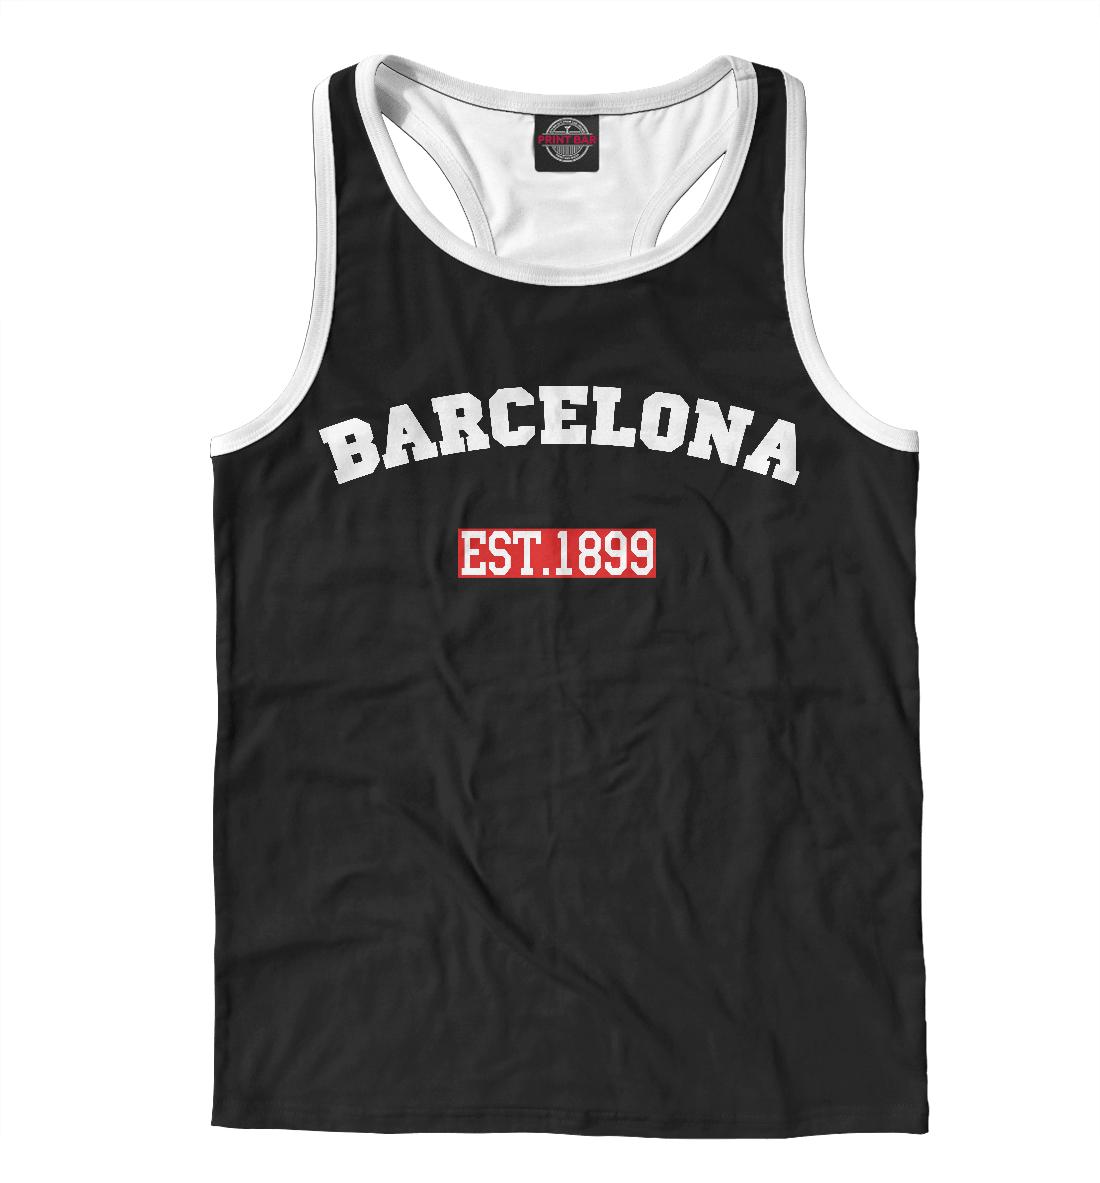 Купить FC Barcelona Est.1899, Printbar, Майки борцовки, BAR-111735-mayb-2